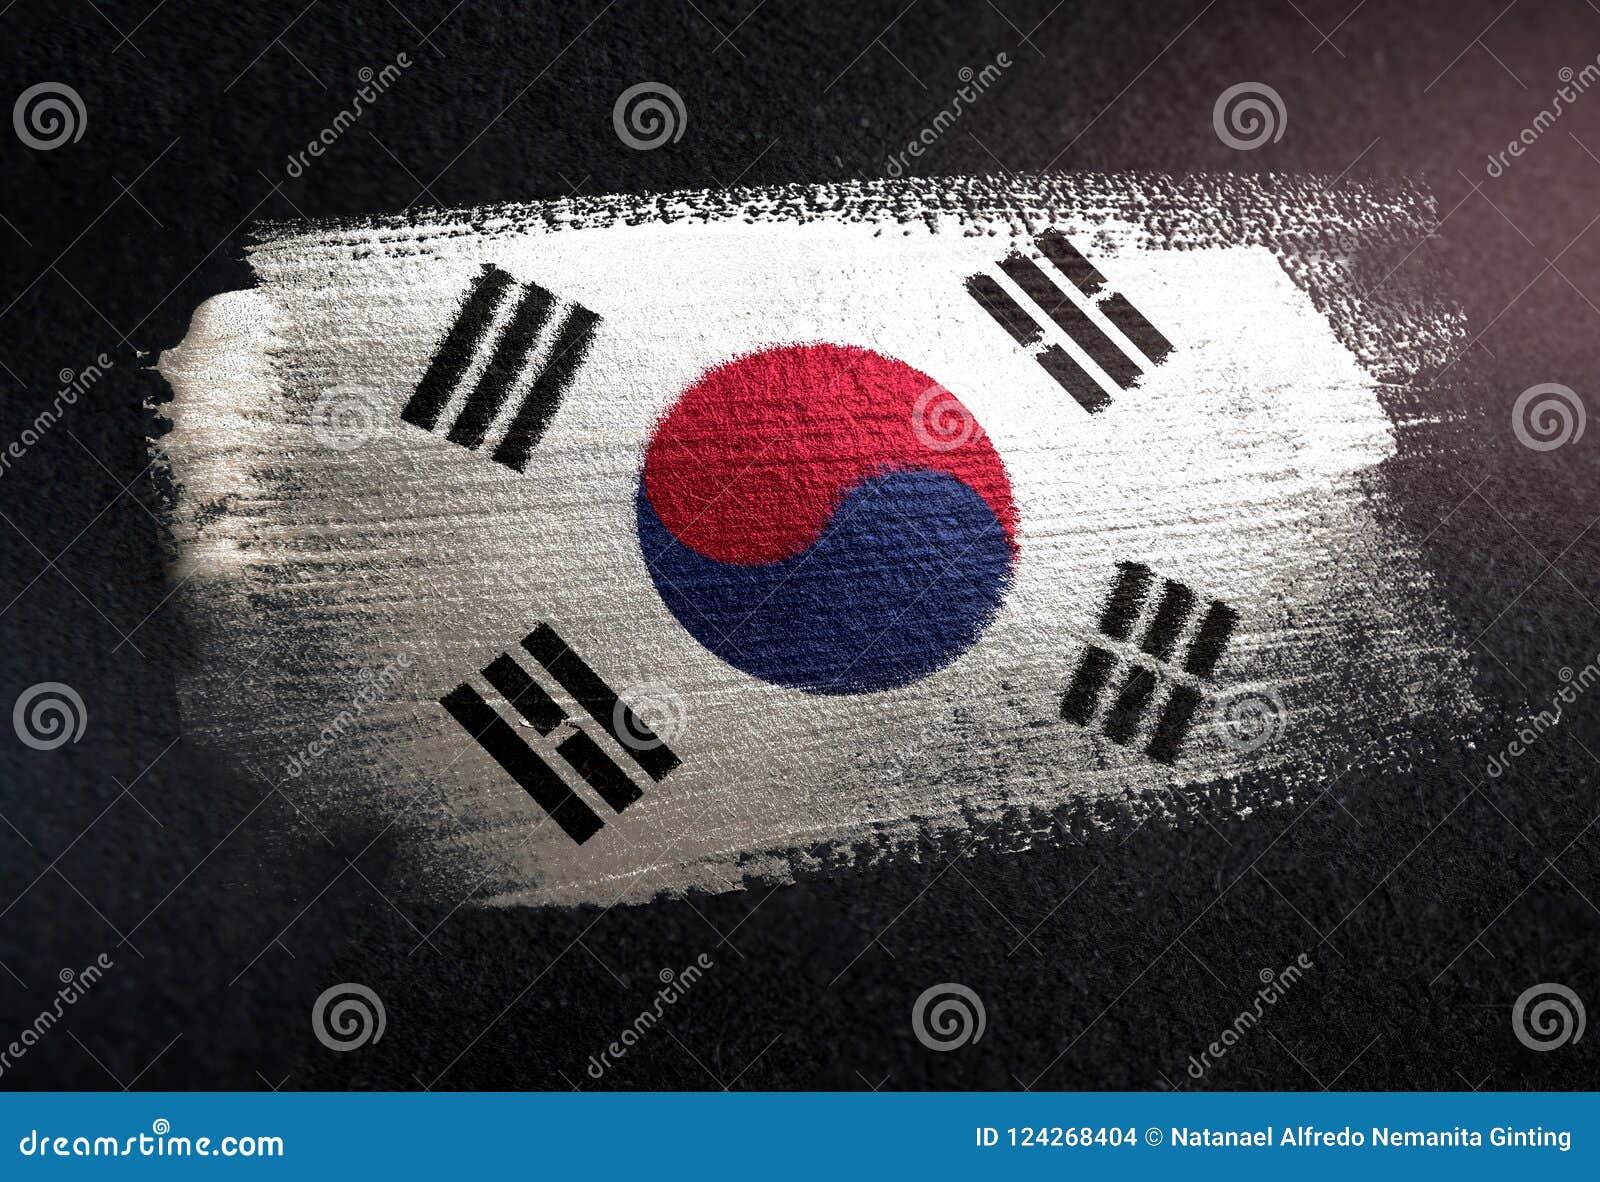 South Korea Flag Made of Metallic Brush Paint on Grunge Dark Wall